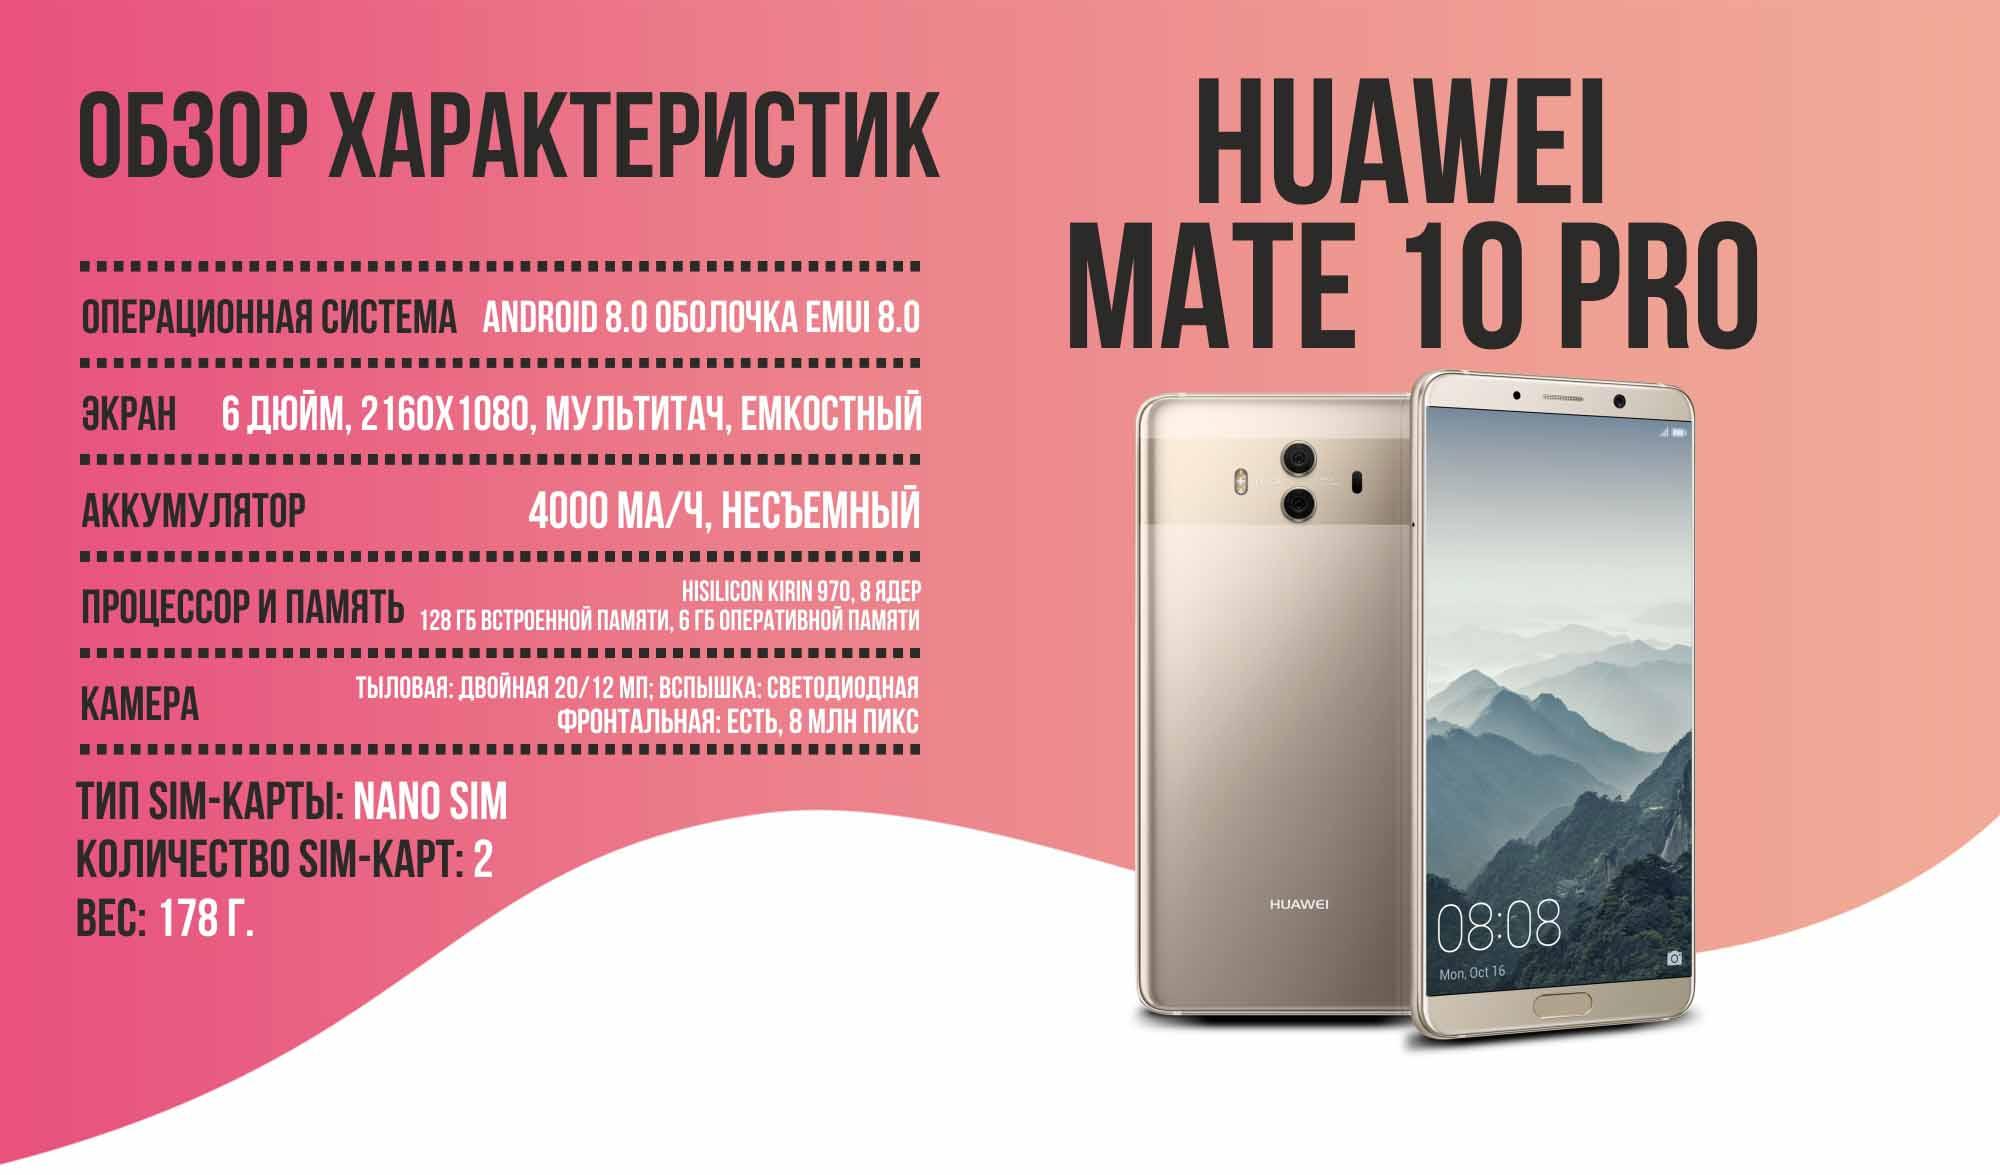 Mate 10 Pro_обзор